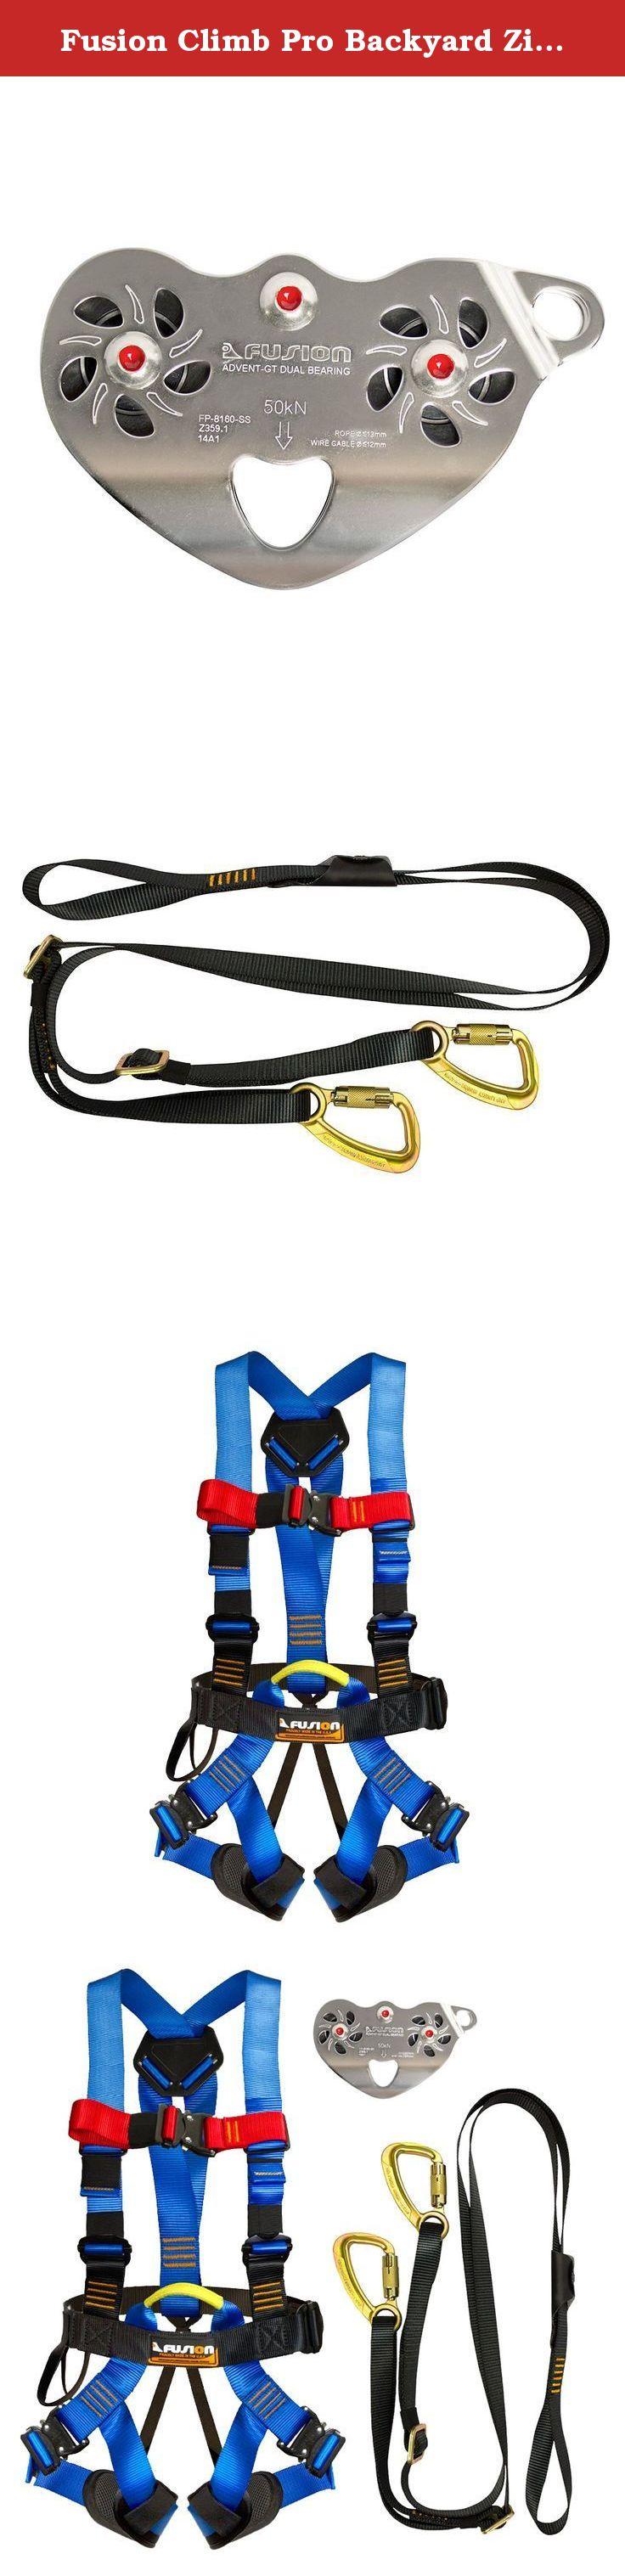 fusion climb pro backyard zip line kit fk a hlt 20 harness lanyard